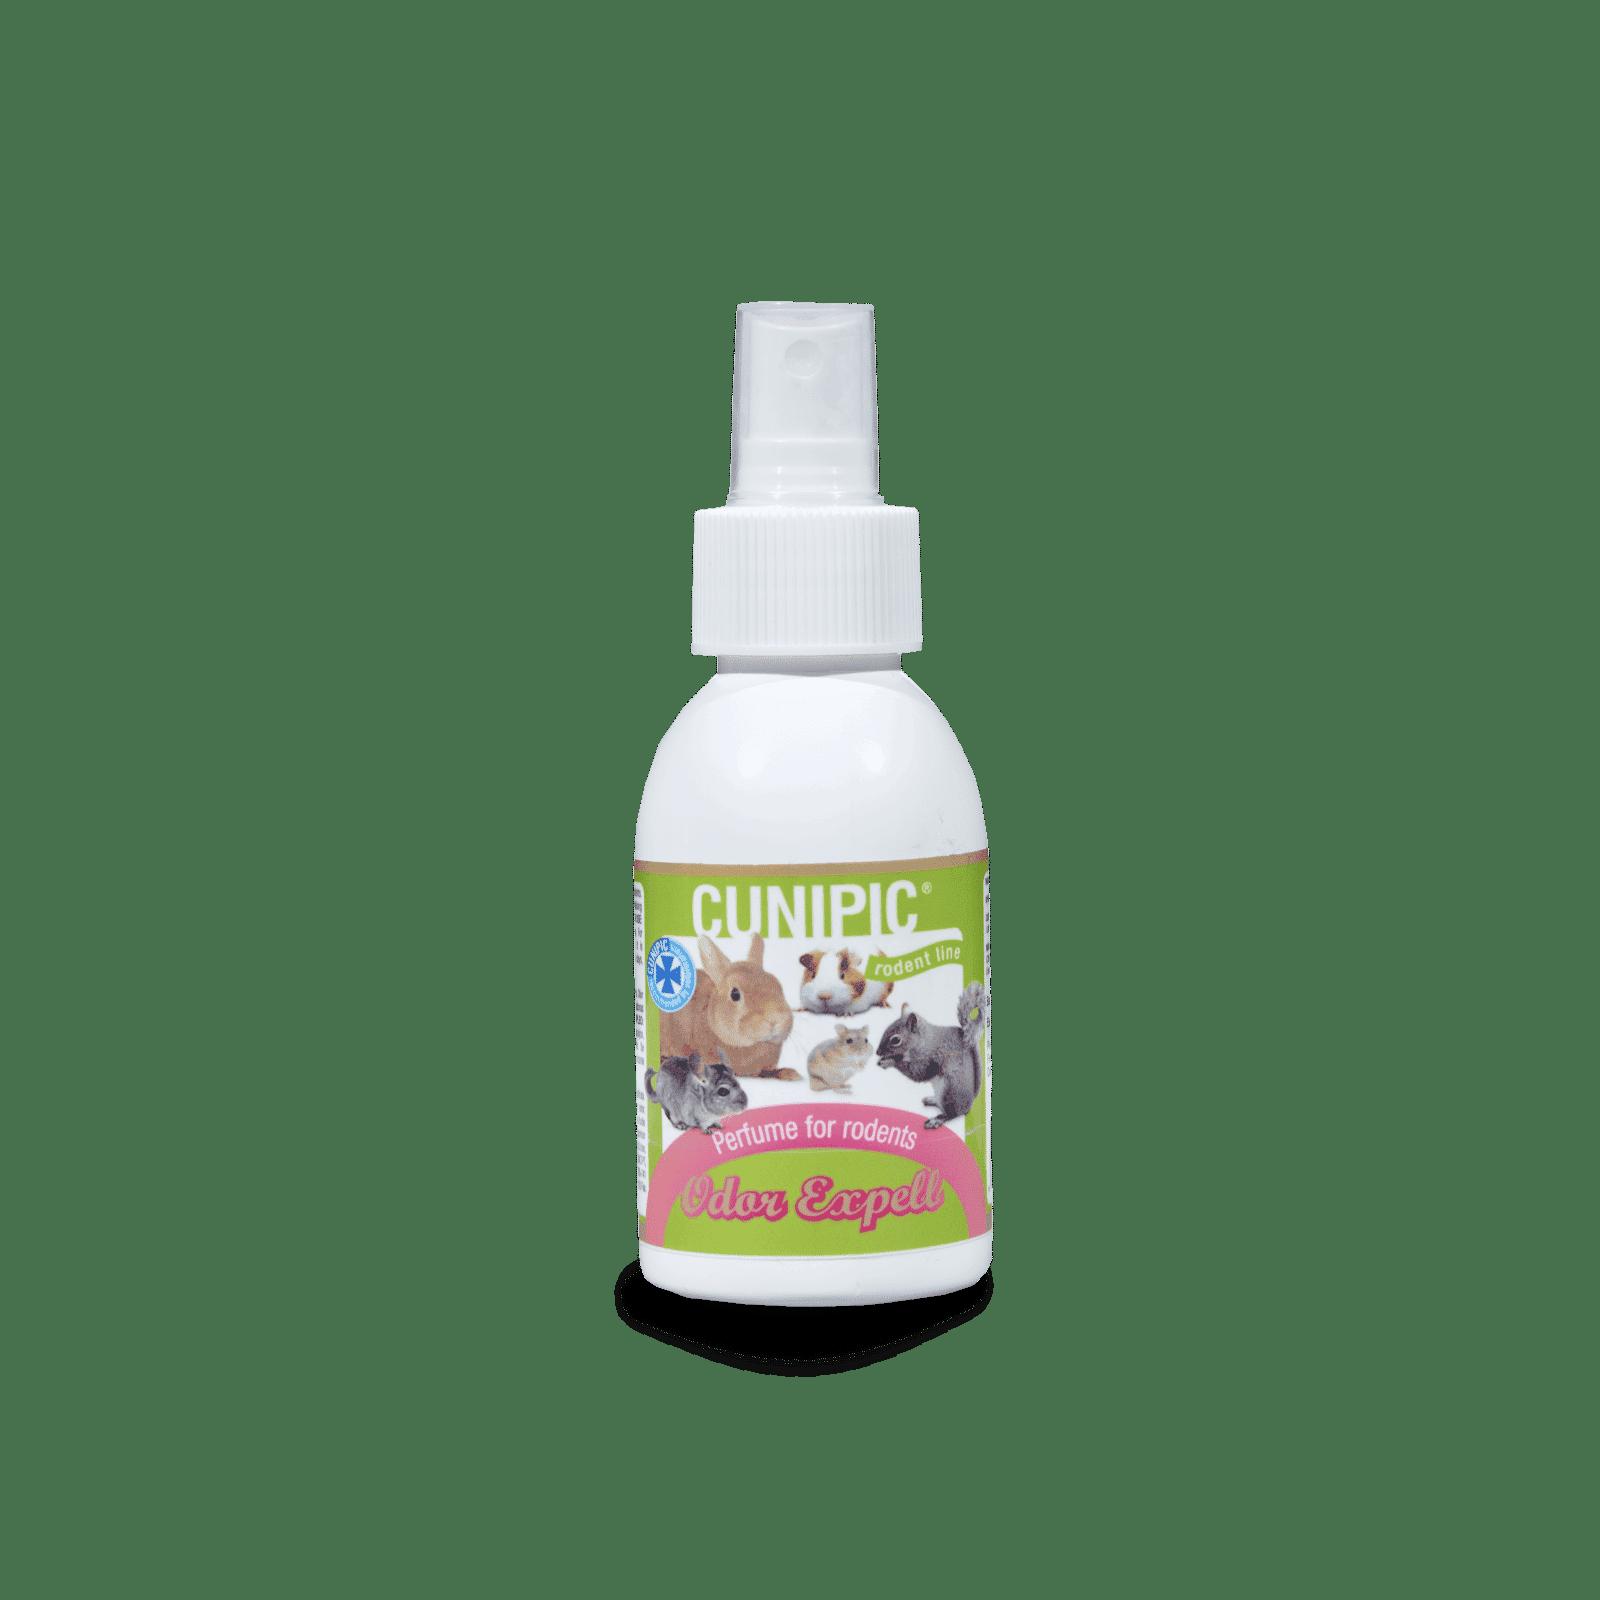 Odor Expell Perfume Anti-olor para conejos y roedores 125 ml Cunipic